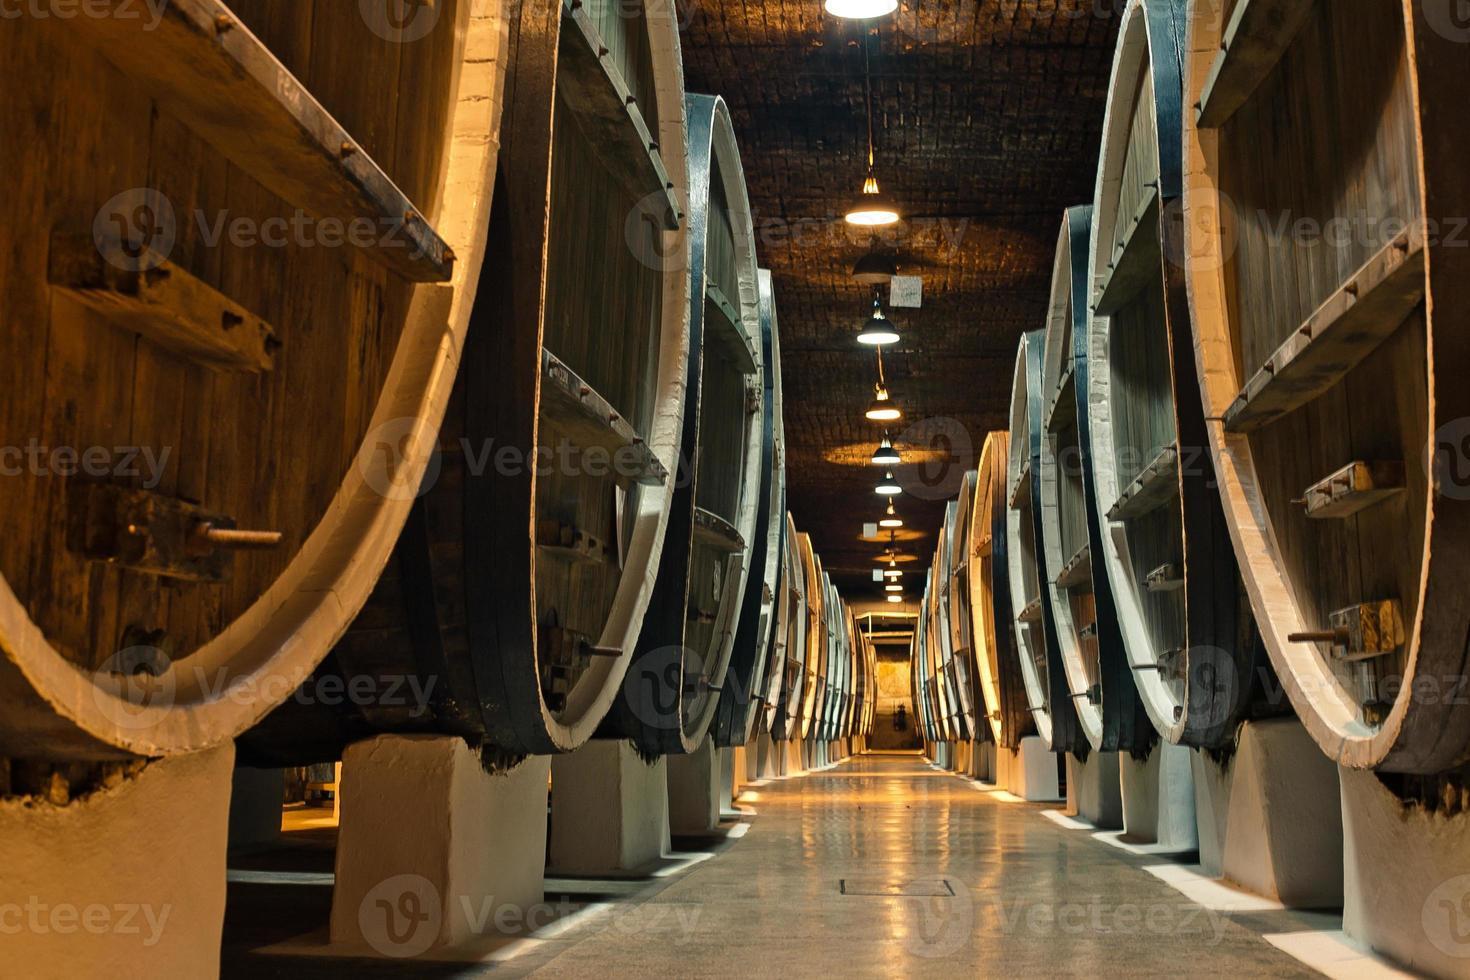 wine barrels in the cellars of winemakers photo